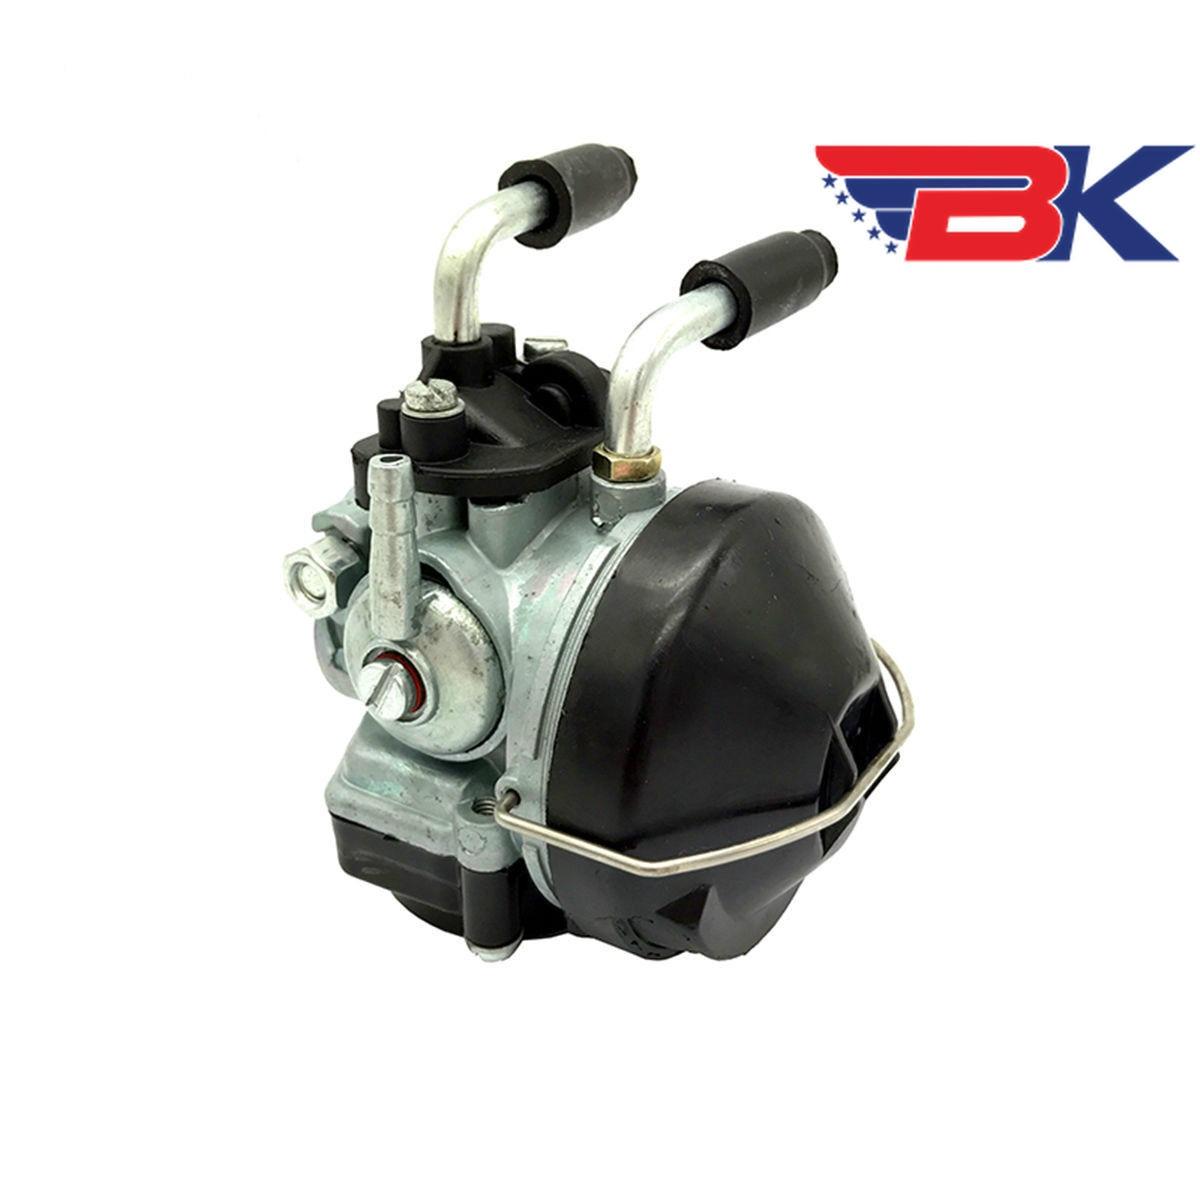 Carburetor For POLINI 19 PHBG 19mm MBK 51 PEUGEOT 103 DELLORTO carb NEUFCarburetor For POLINI 19 PHBG 19mm MBK 51 PEUGEOT 103 DELLORTO carb NEUF